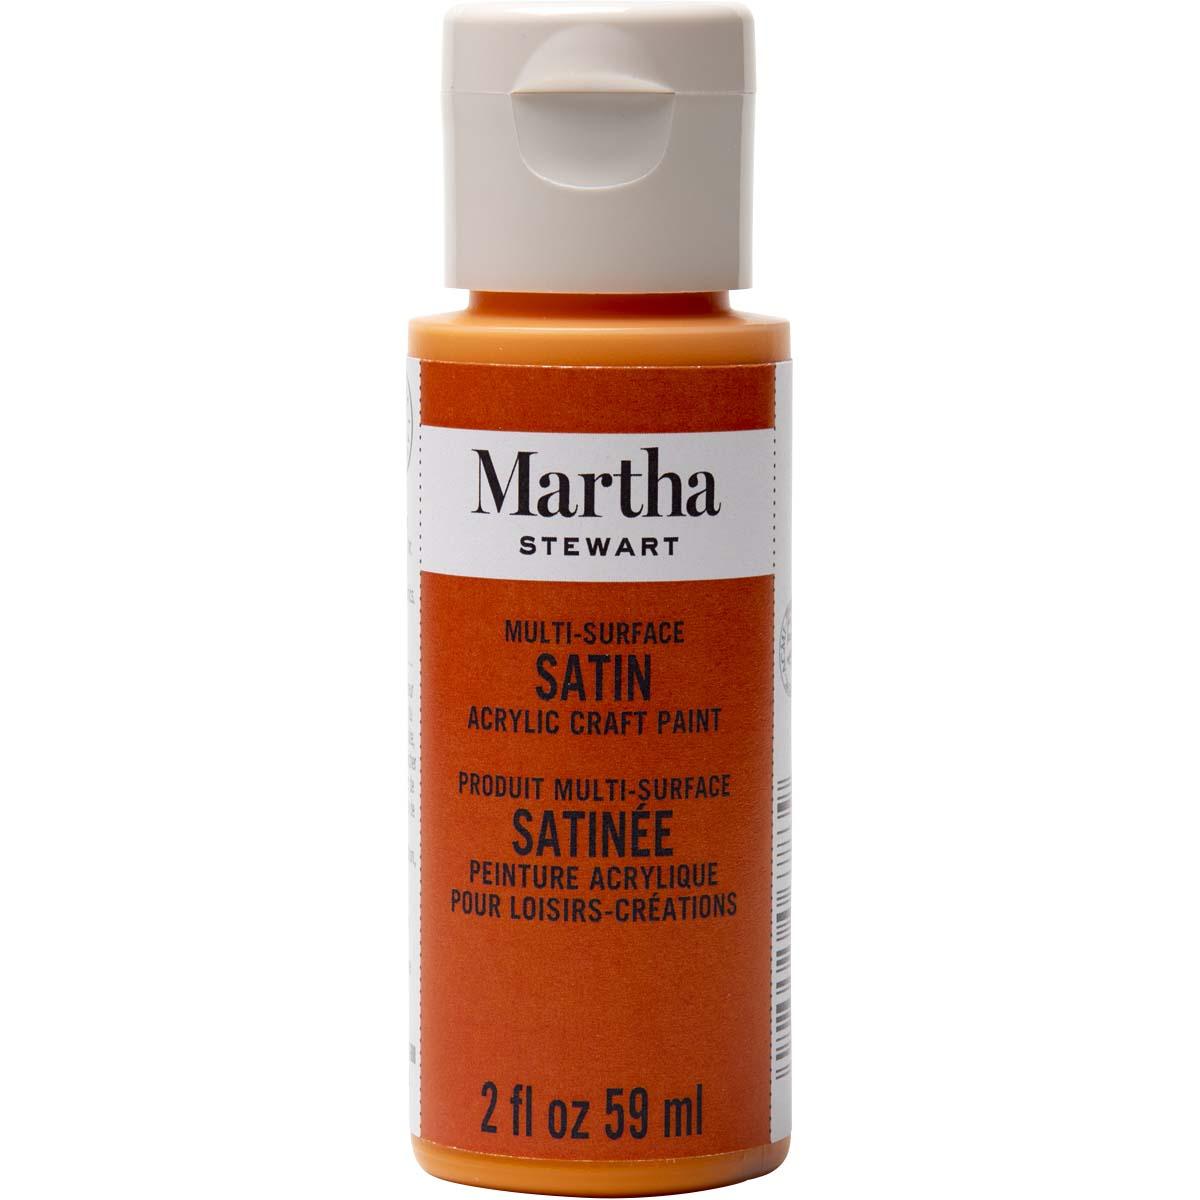 Martha Stewart® 2oz Multi-Surface Satin Acrylic Craft Paint - Marmalade